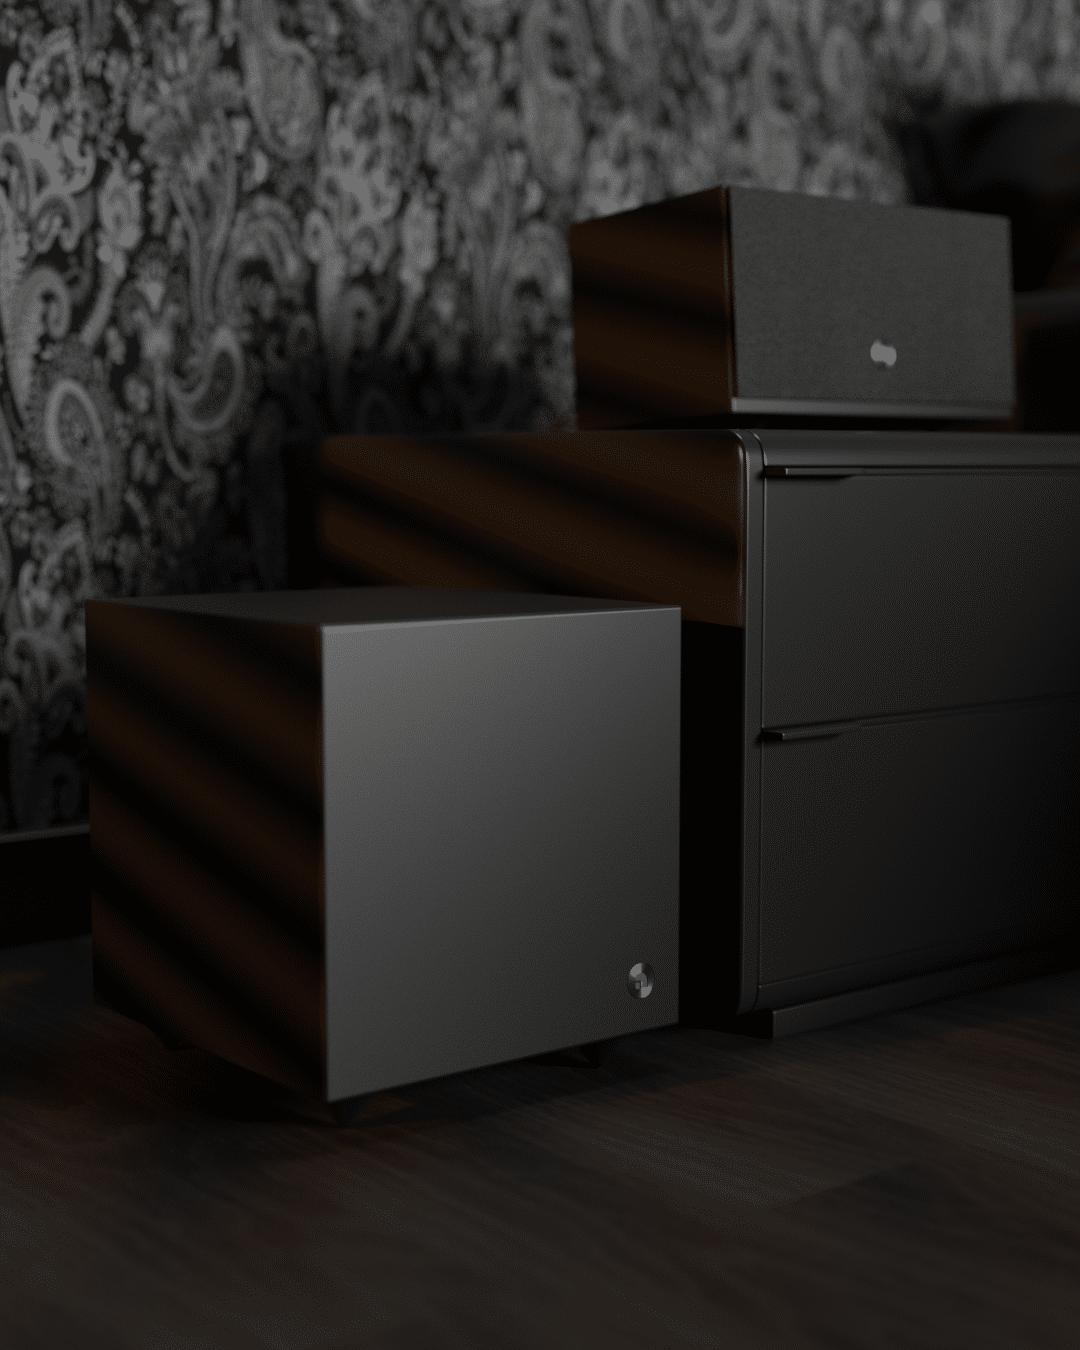 Active subwoofer SW 5wireless multiroom speaker C10MkII black SoMe AudioPro 01